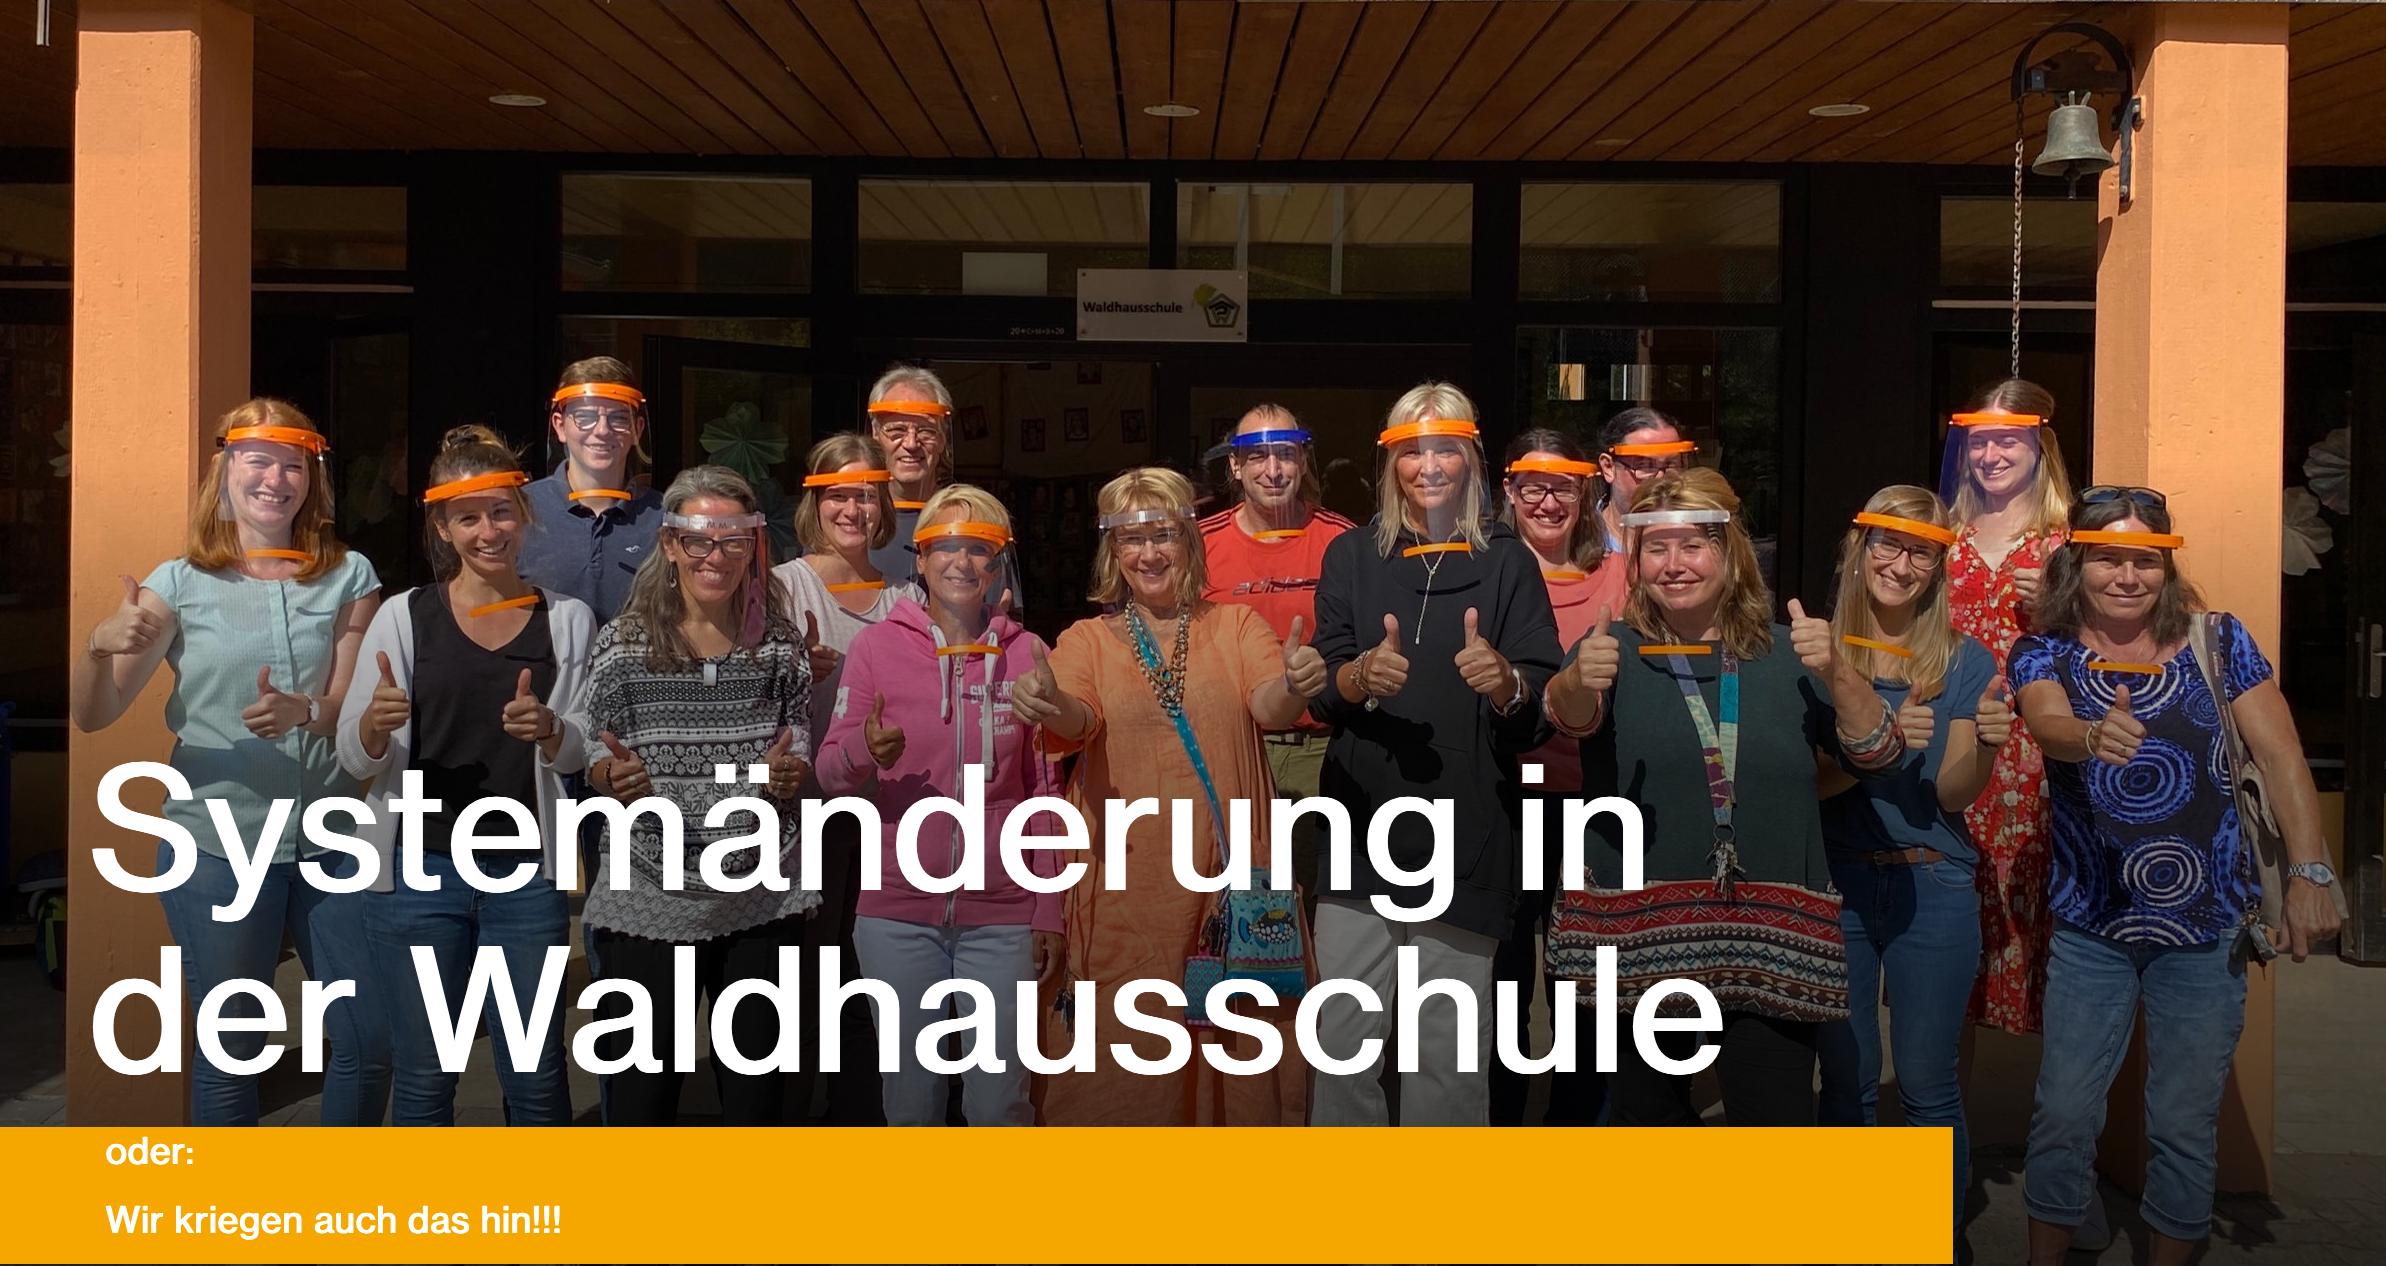 Waldhausschule goes digital  2